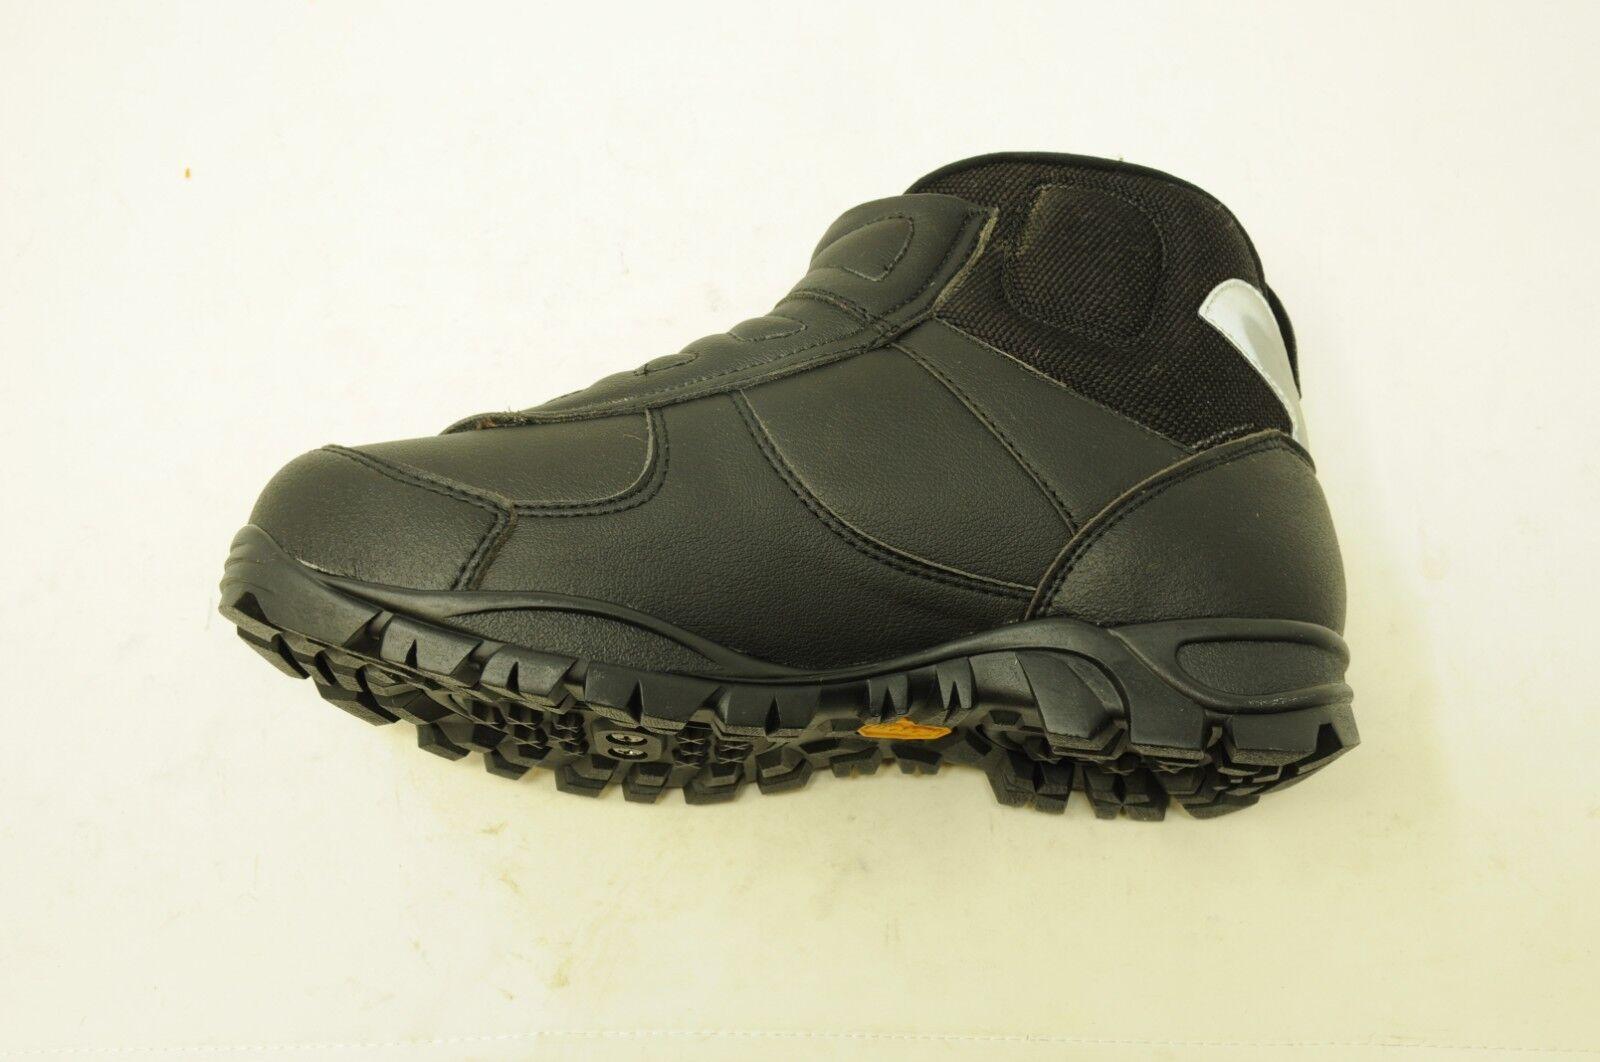 Nalini Vibram Winter Working shoes   Boots -    Black - Choose Size (  ) 7b1d44